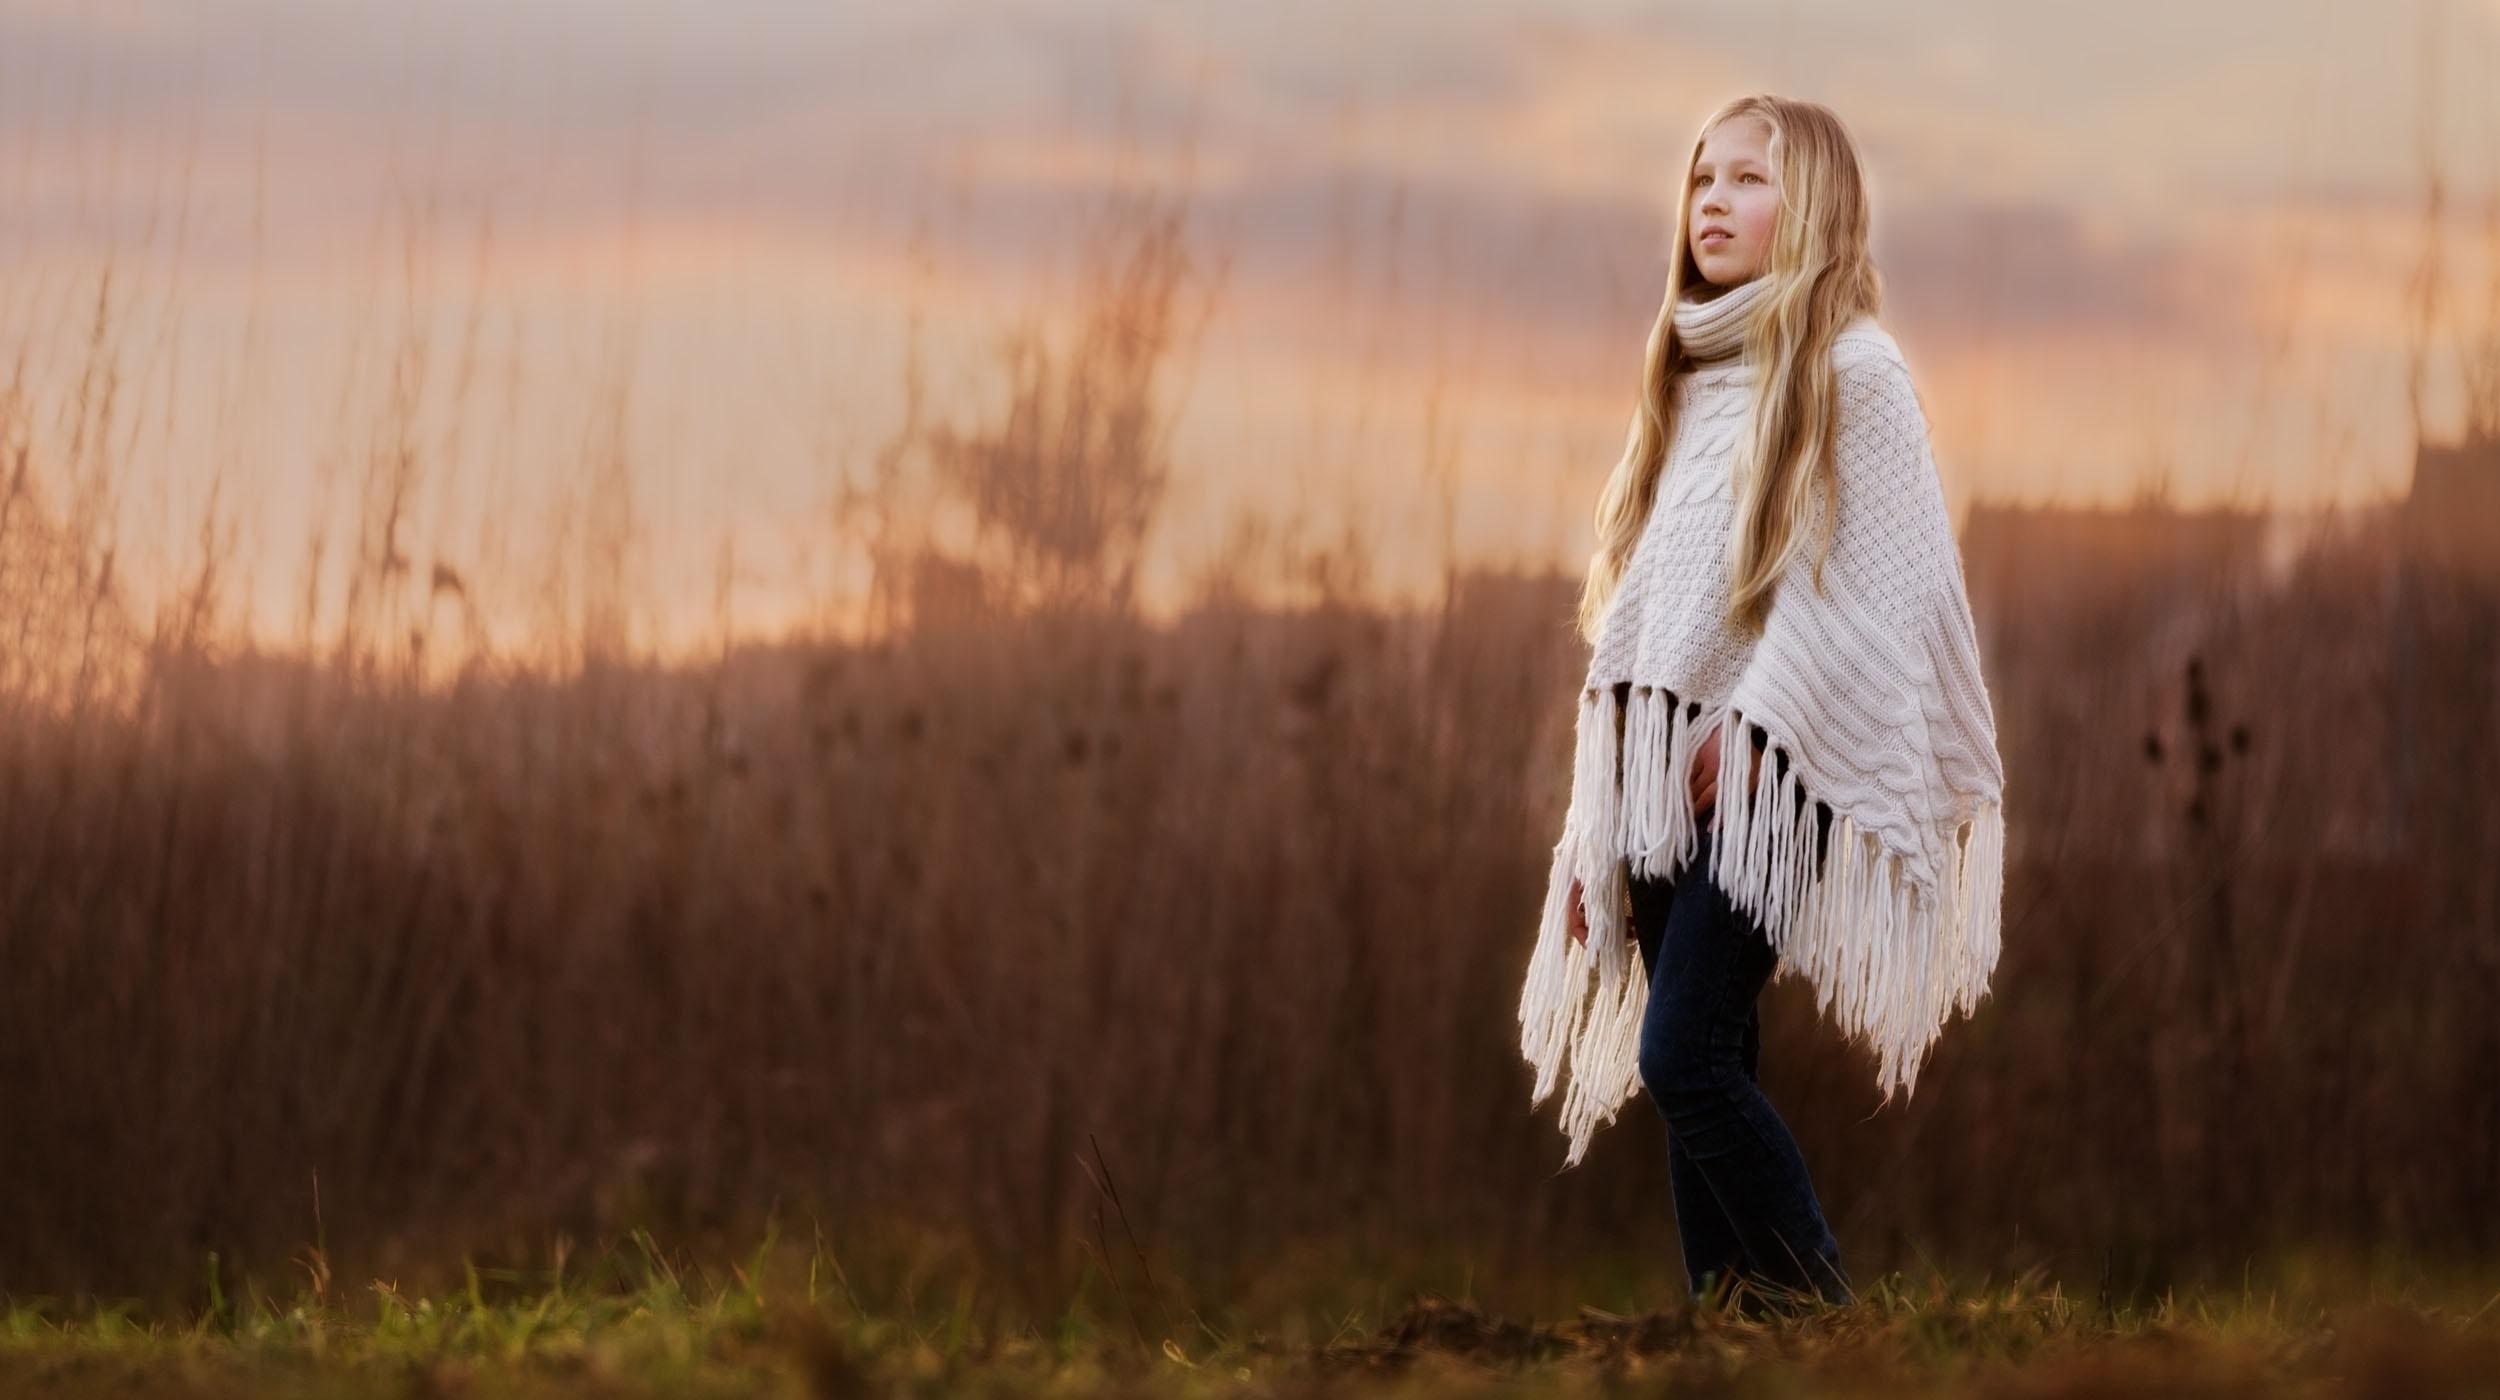 kinderfotografie Rotterdam meisje dame romantisch zonsondergang